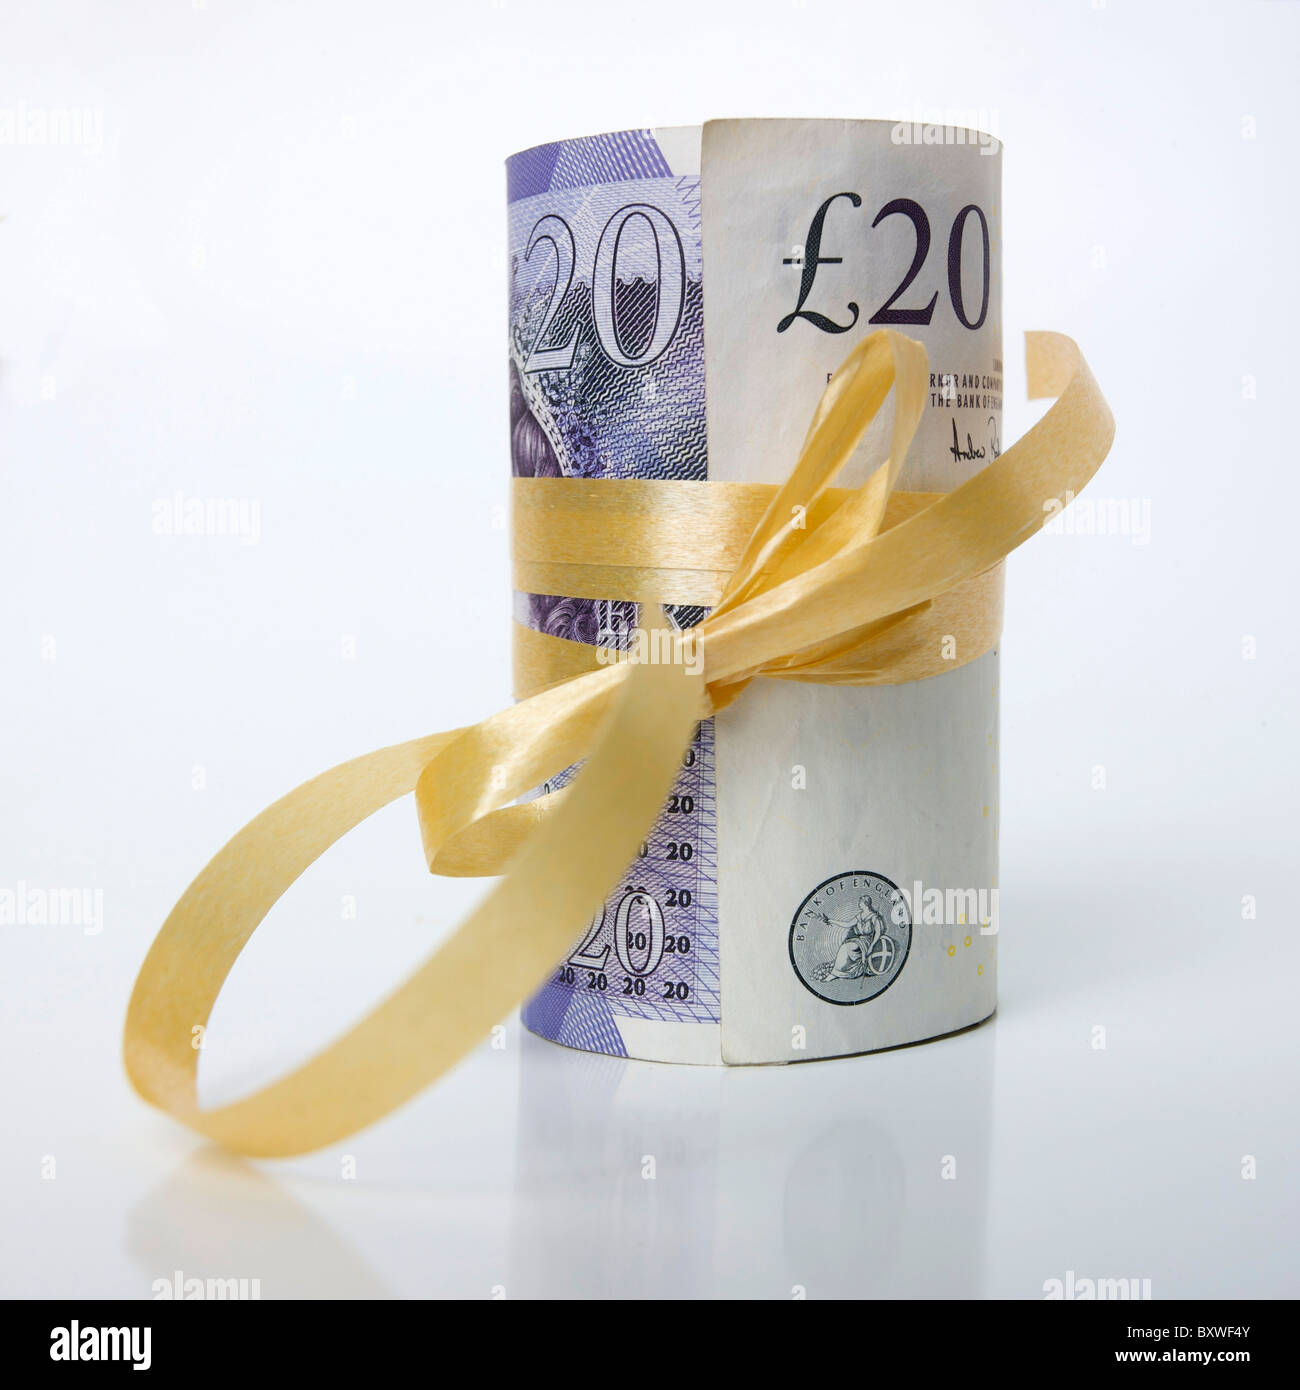 Montón de billetes, laminados / libra esterlina británica - GBP Don Dinero / actualidad / Concepto de Imagen De Stock